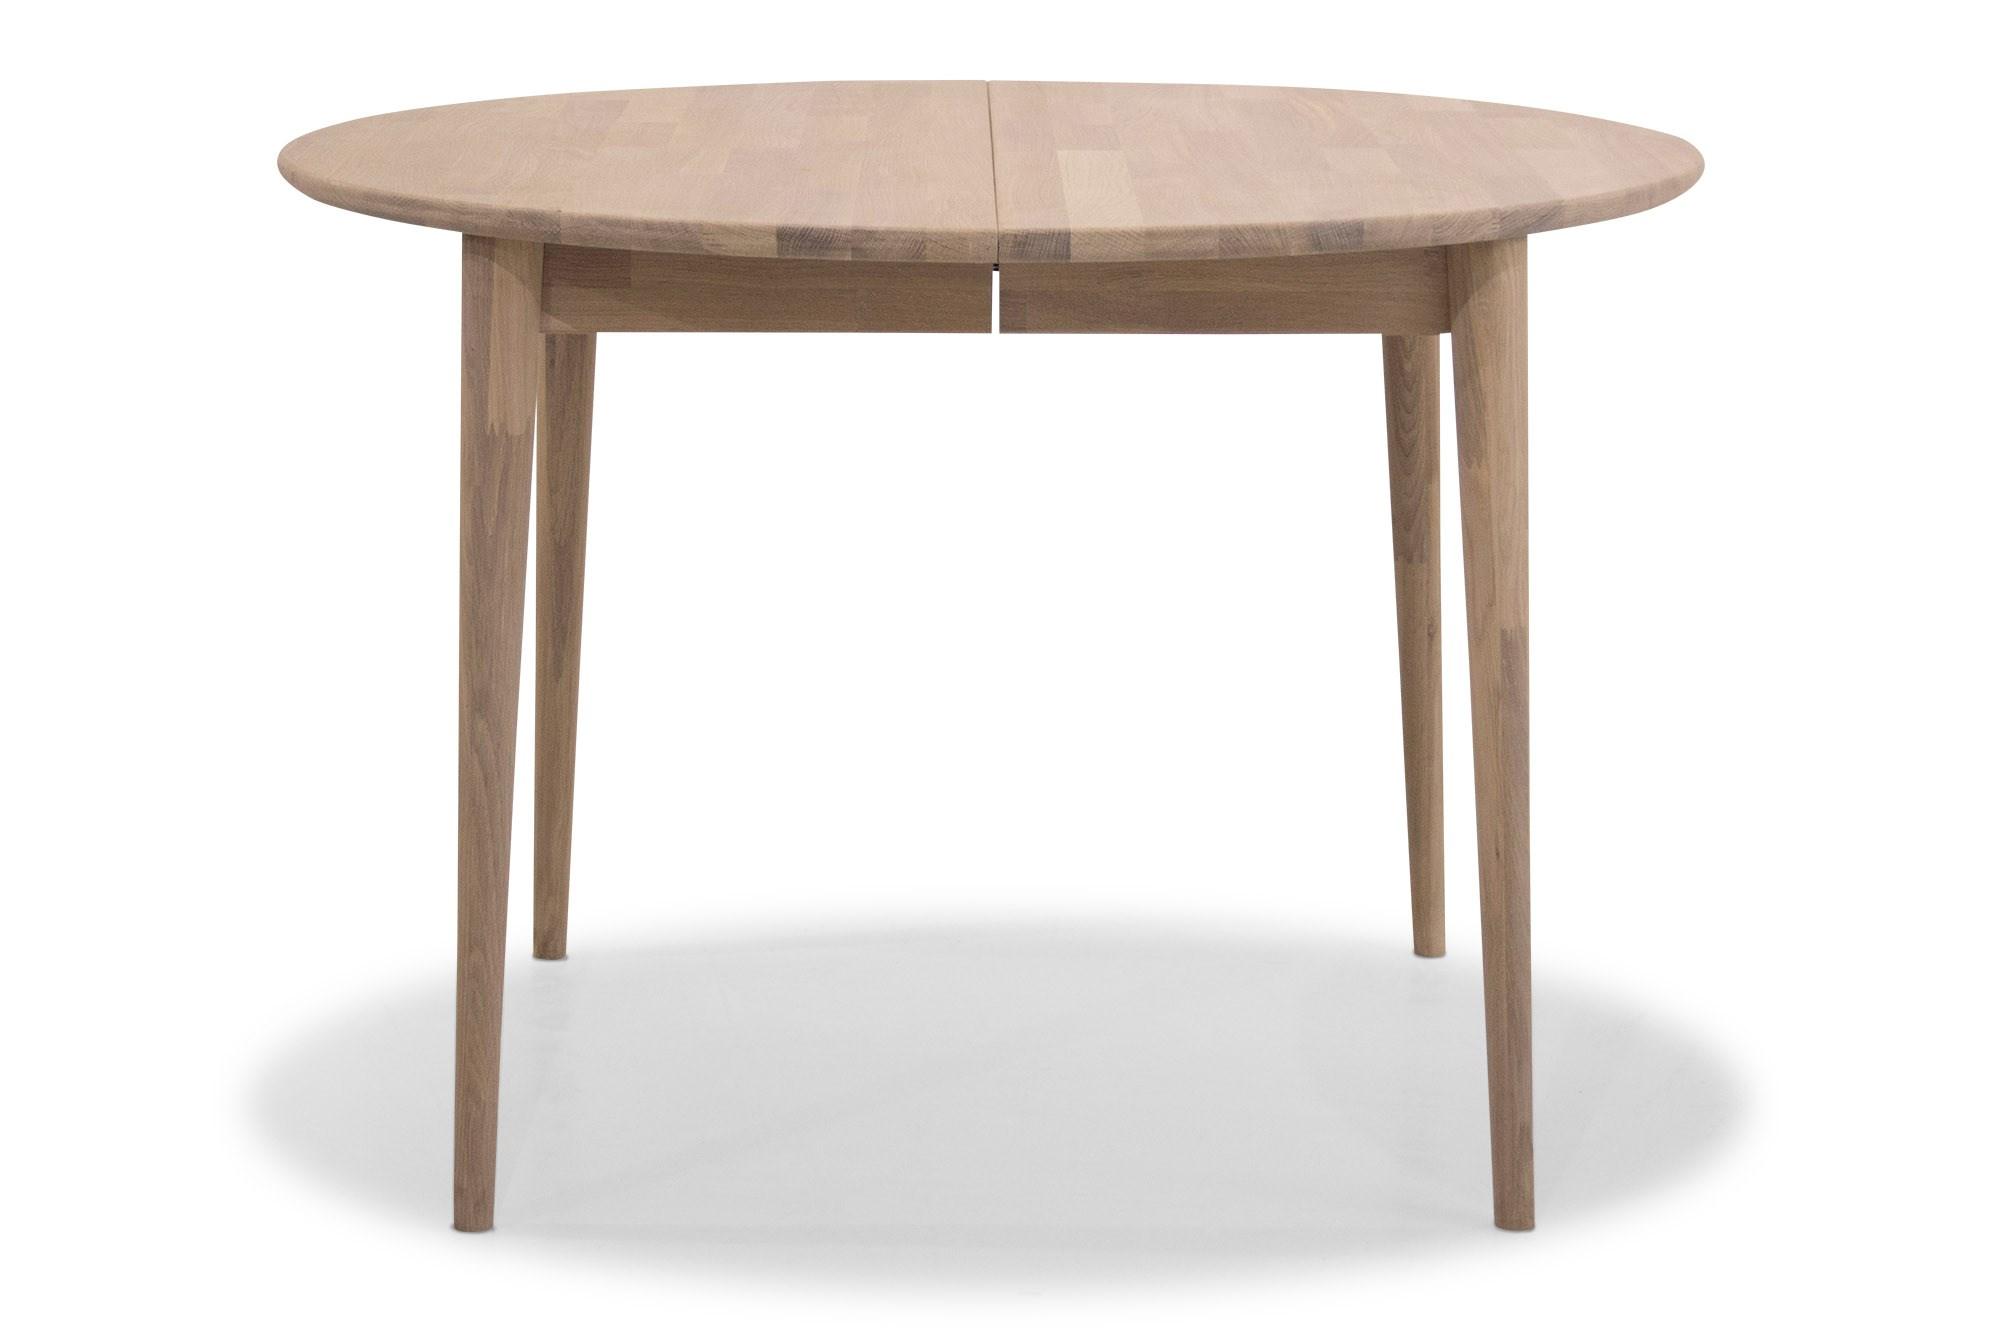 spisebord rundt FUTURA SPISEBORD RUNDT   My Home Møbler spisebord rundt